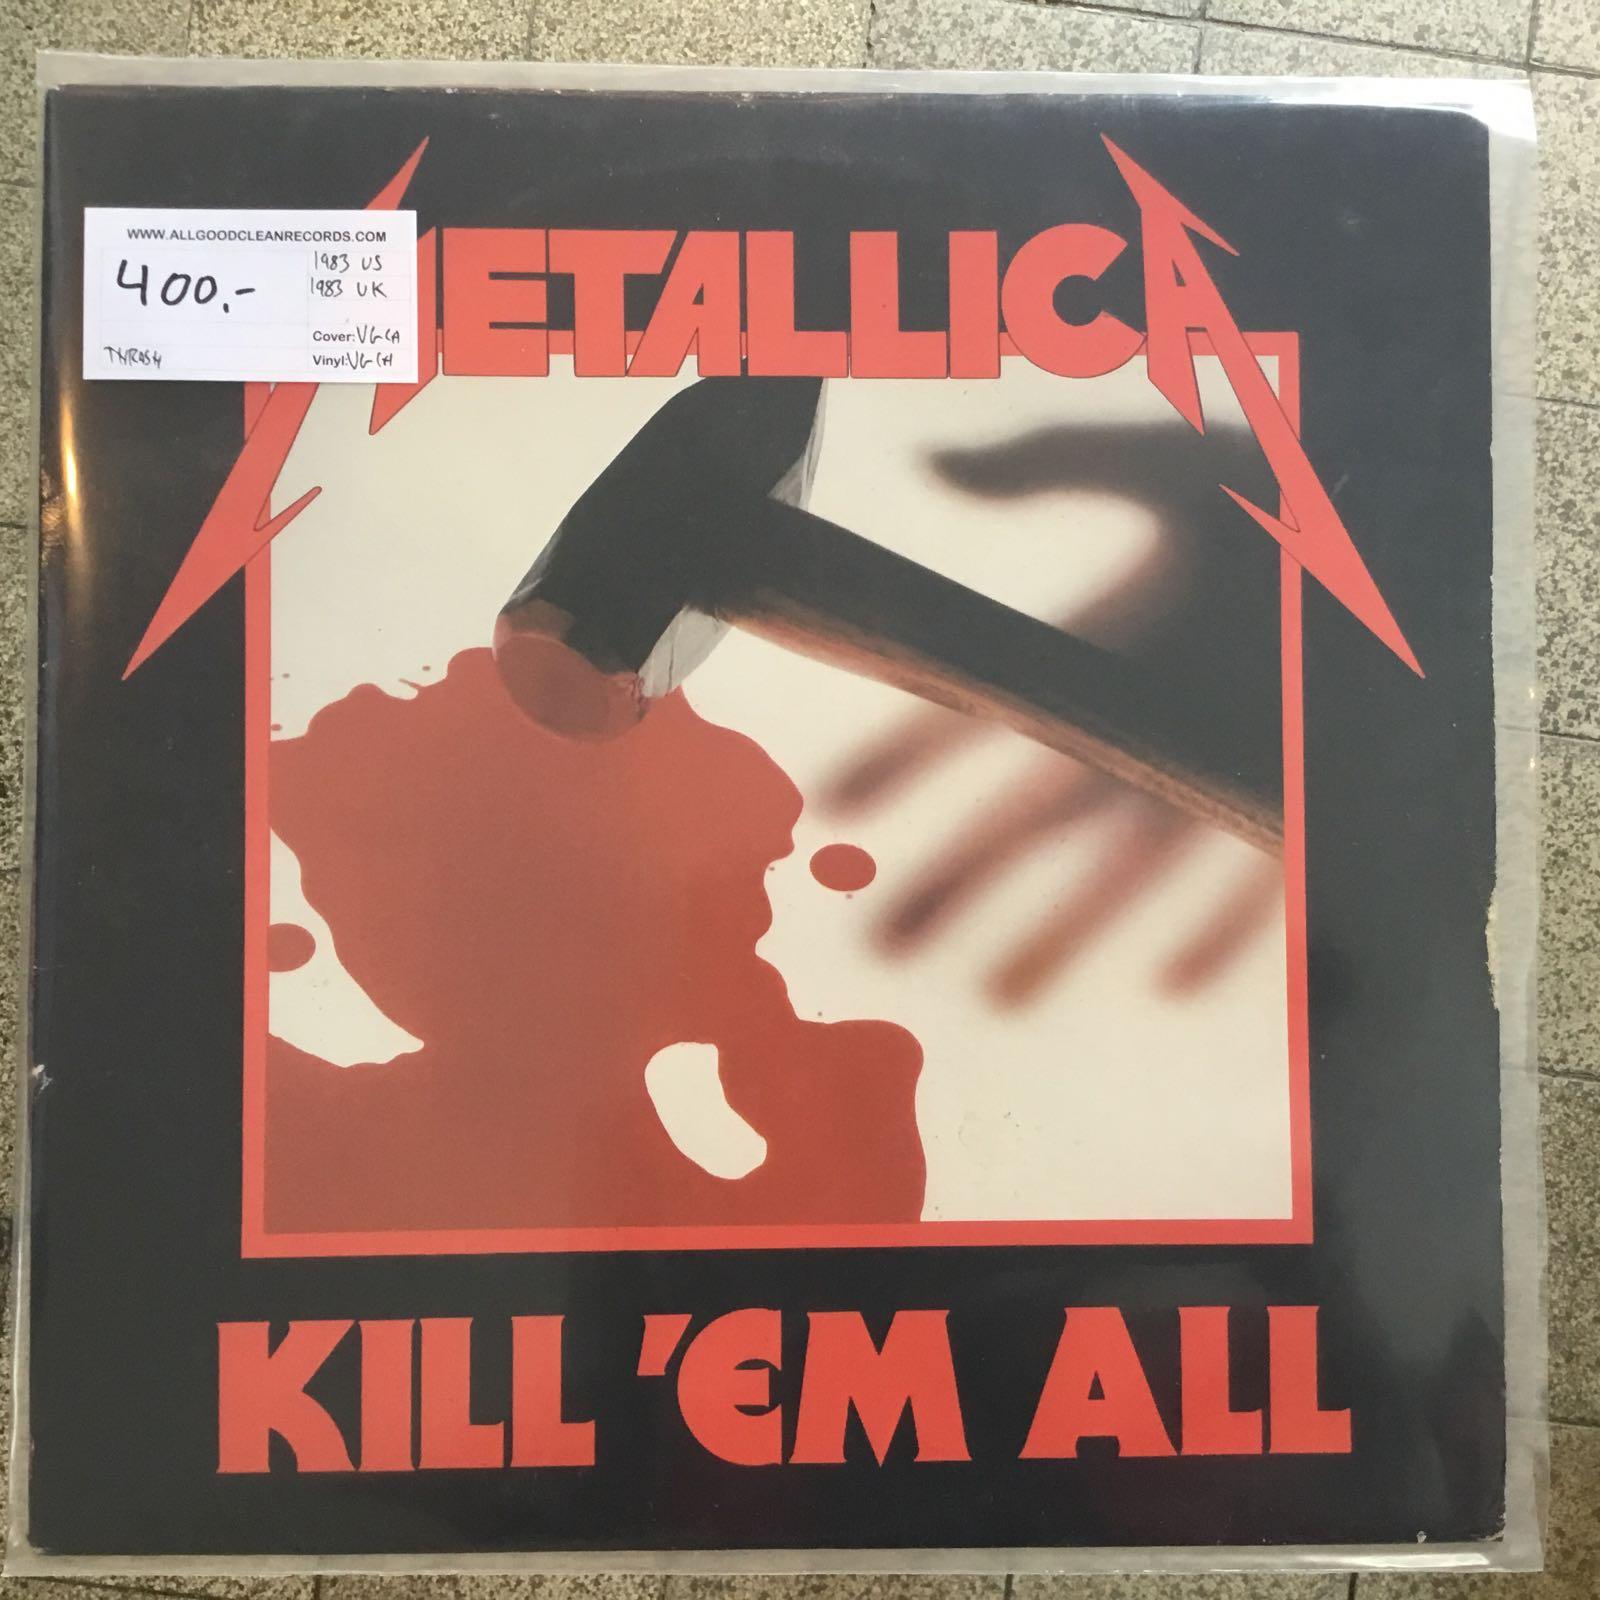 Metallica – Kill 'em All [LP] (2. hand)